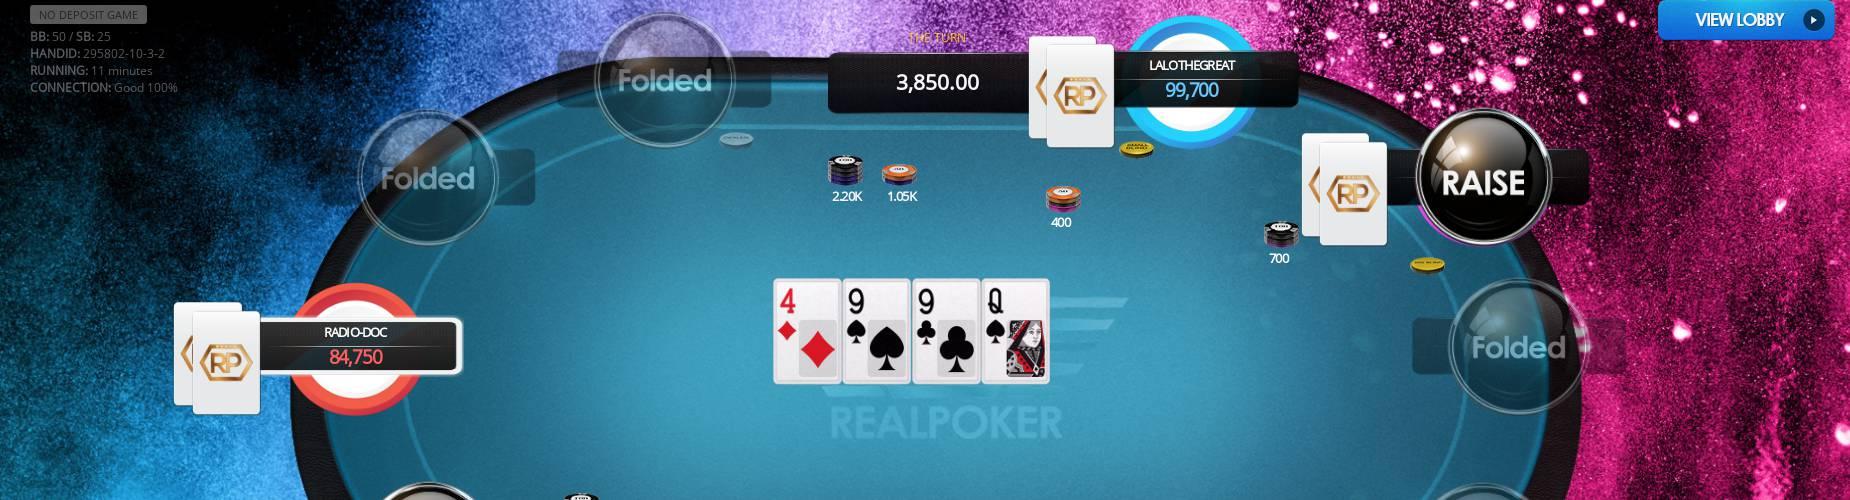 casino sin deposito españa 2019